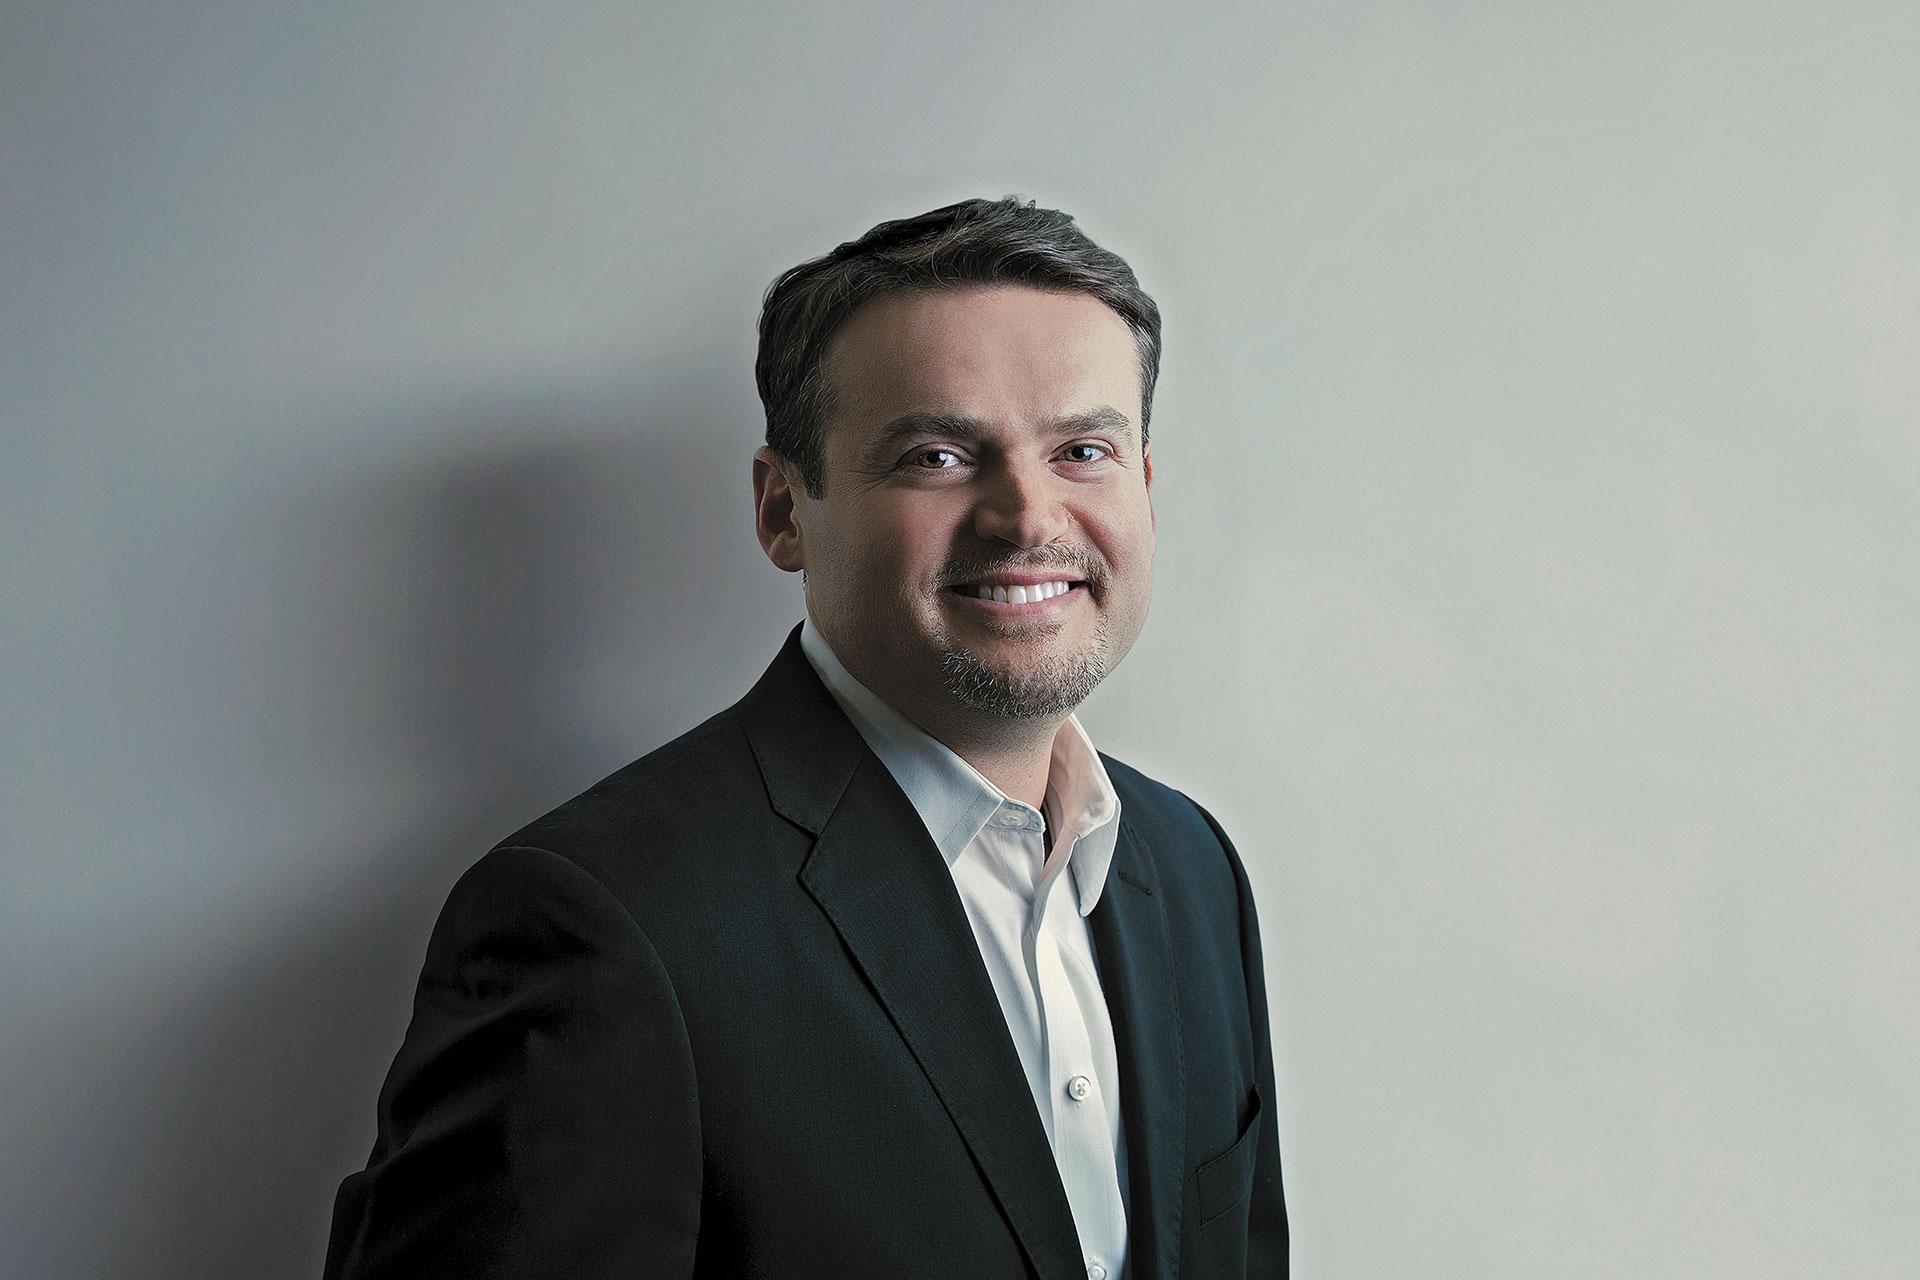 Building the next billion-dollar software company